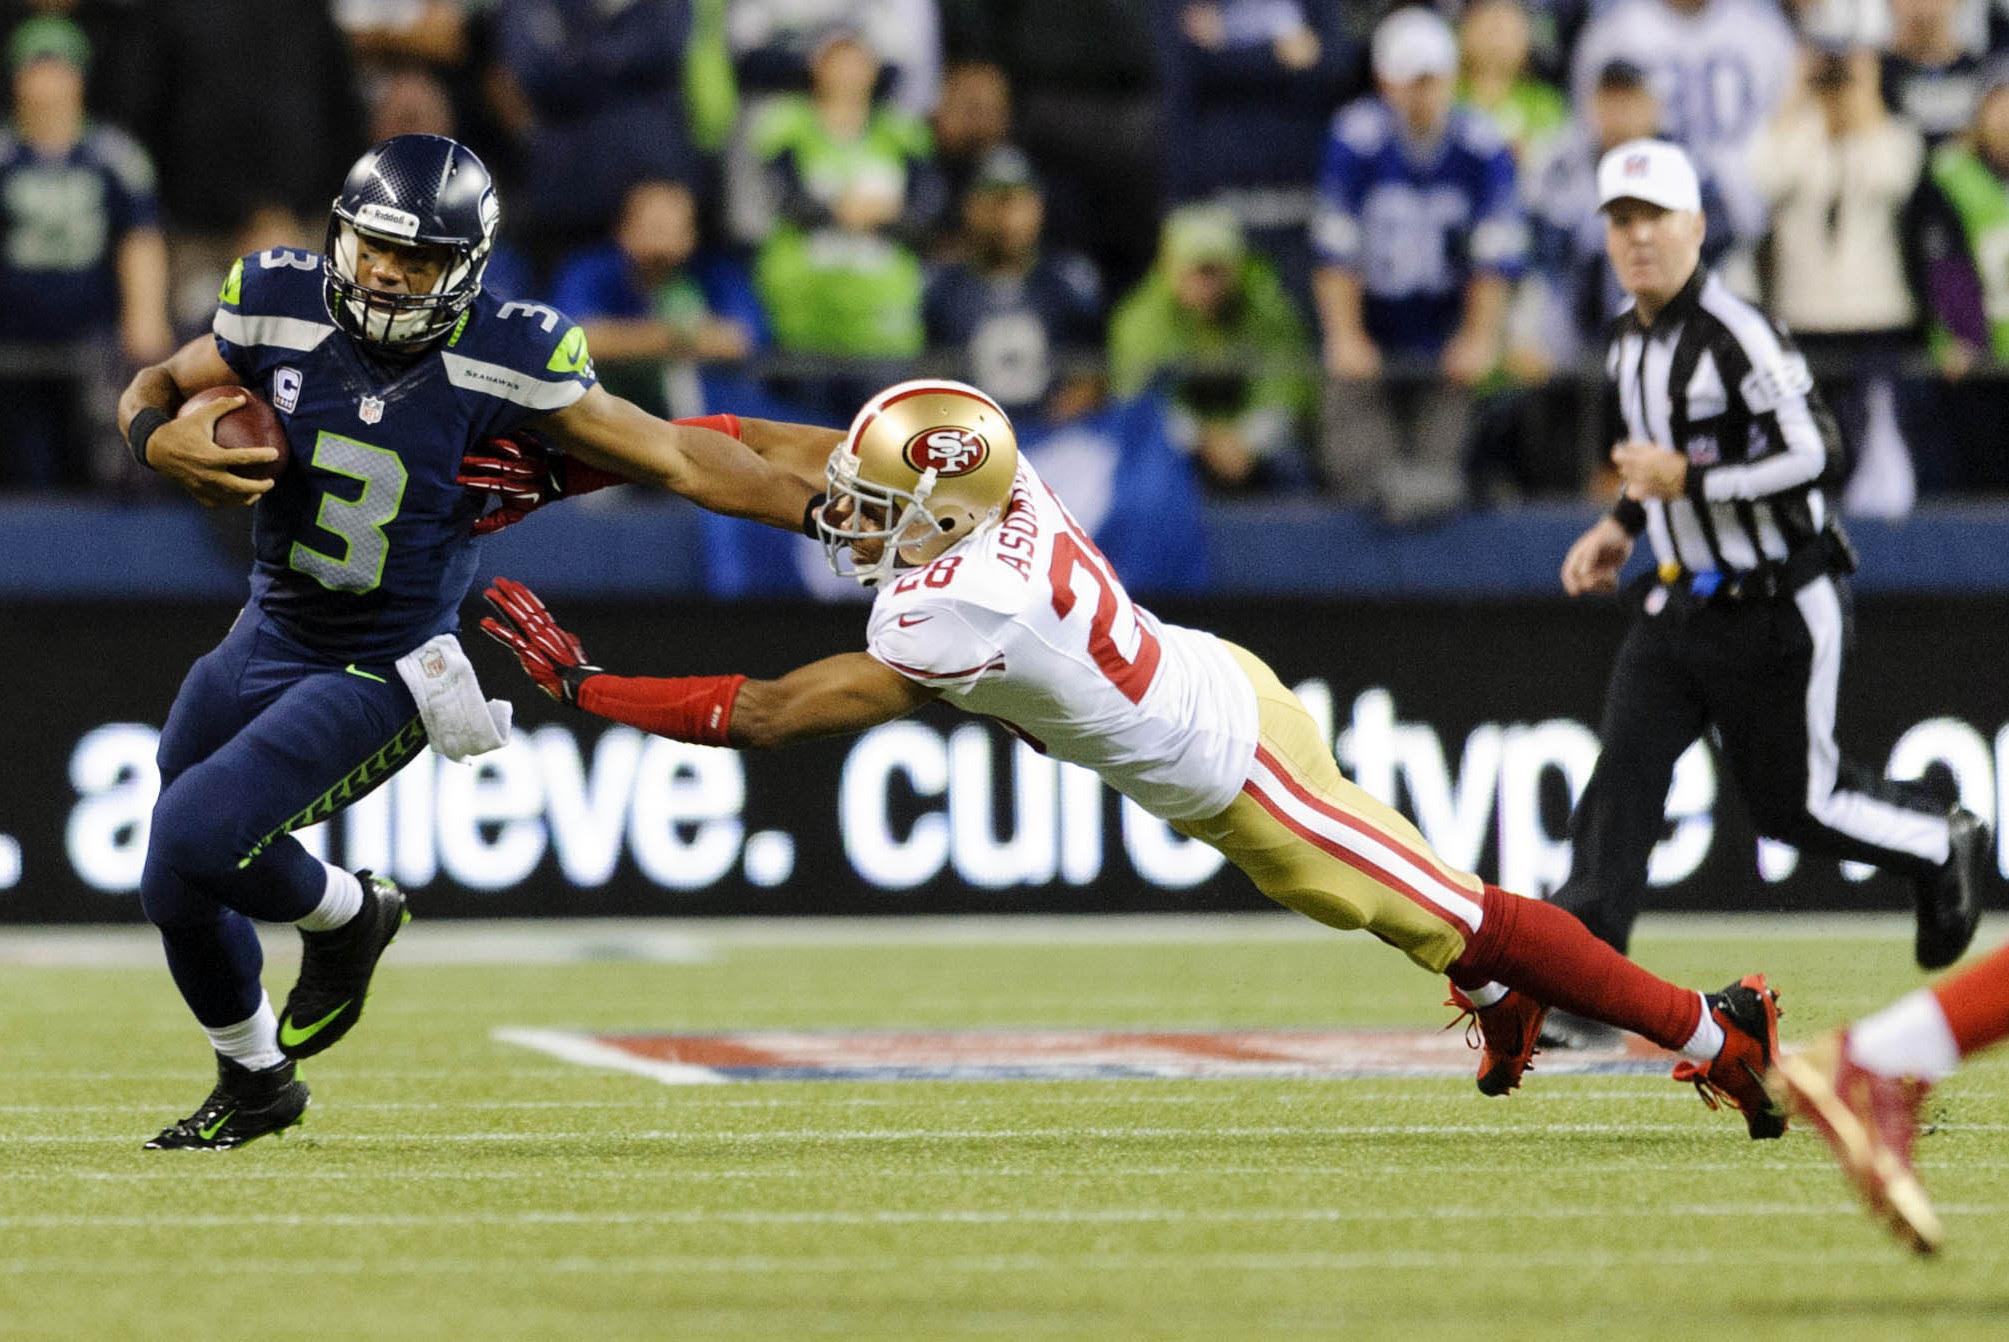 NFL Week 14 Picks: Complete Selections and Breakdown of Best Games | Bleacher Report